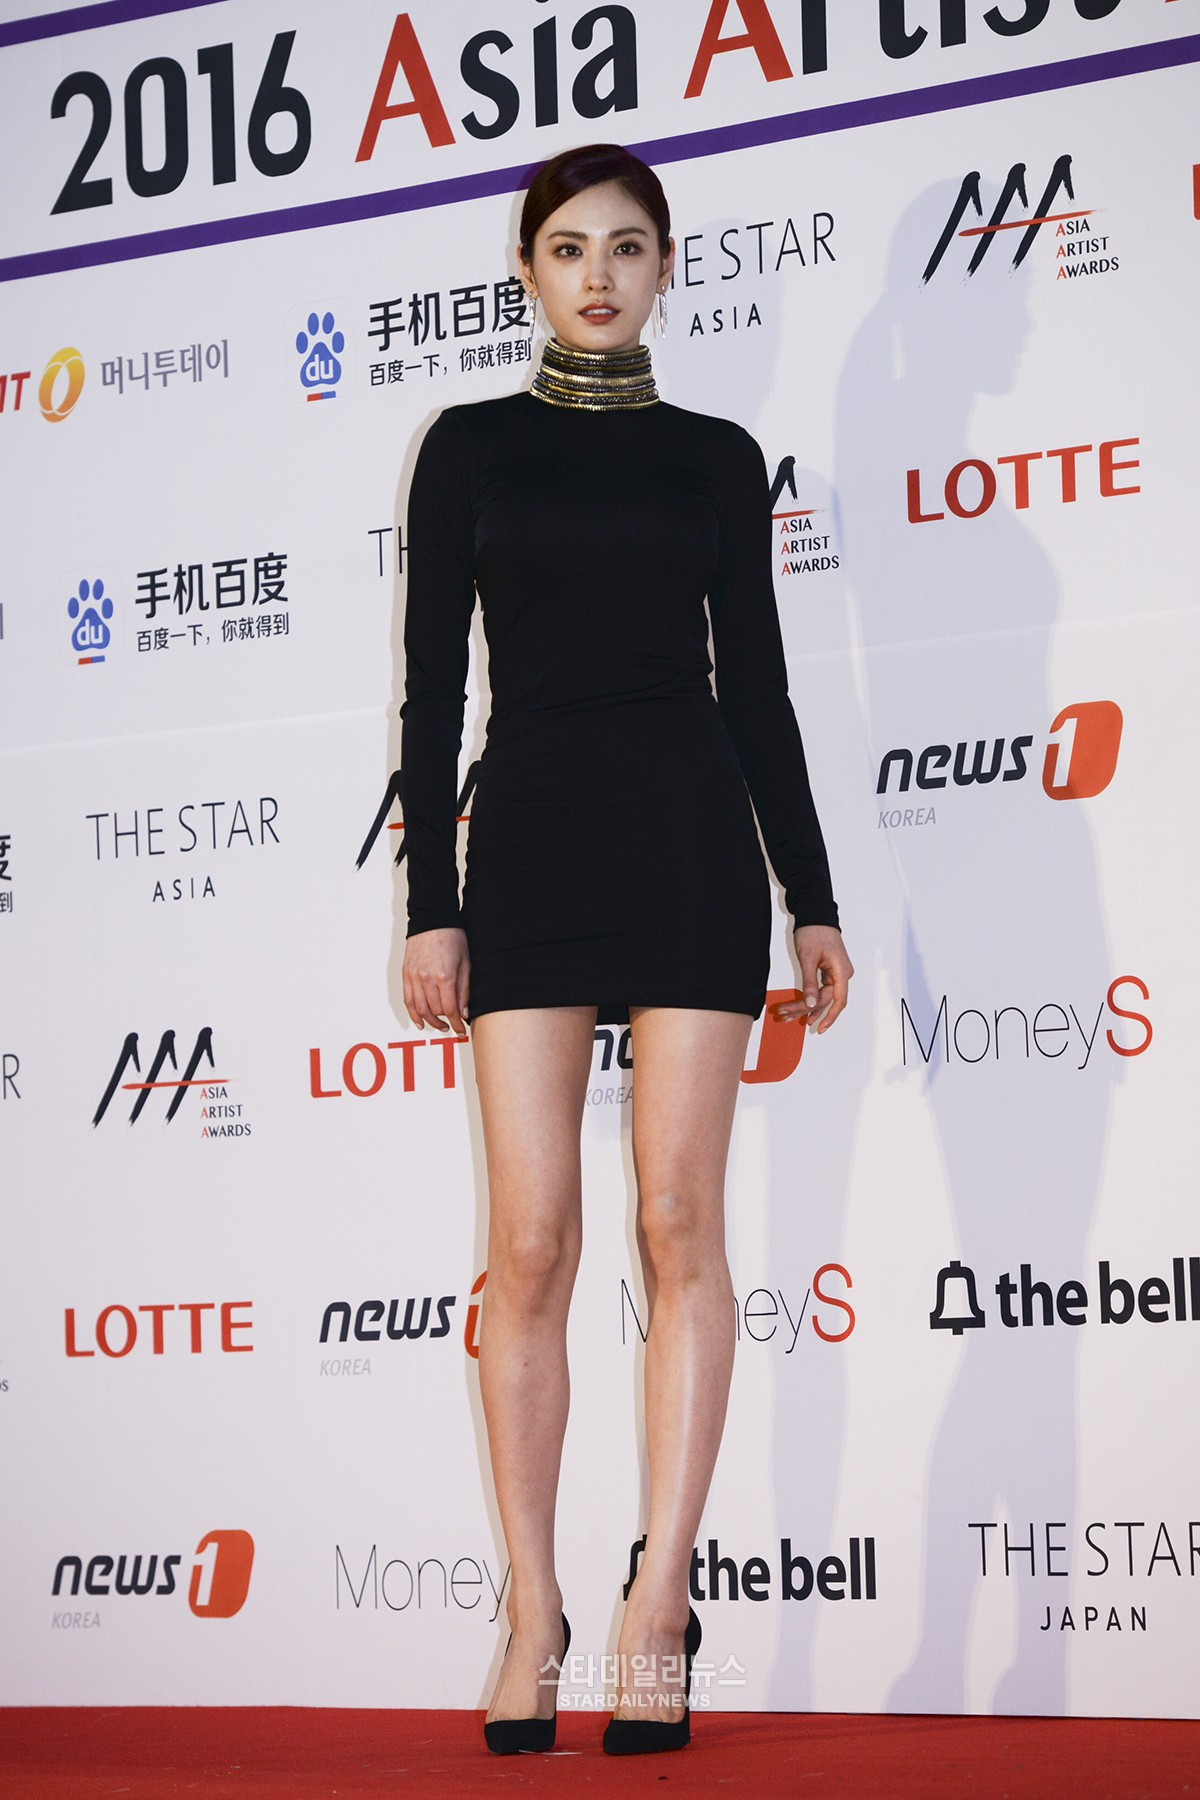 K-Pop And K-Drama Stars Shine At 2016 Asia Artist Awards